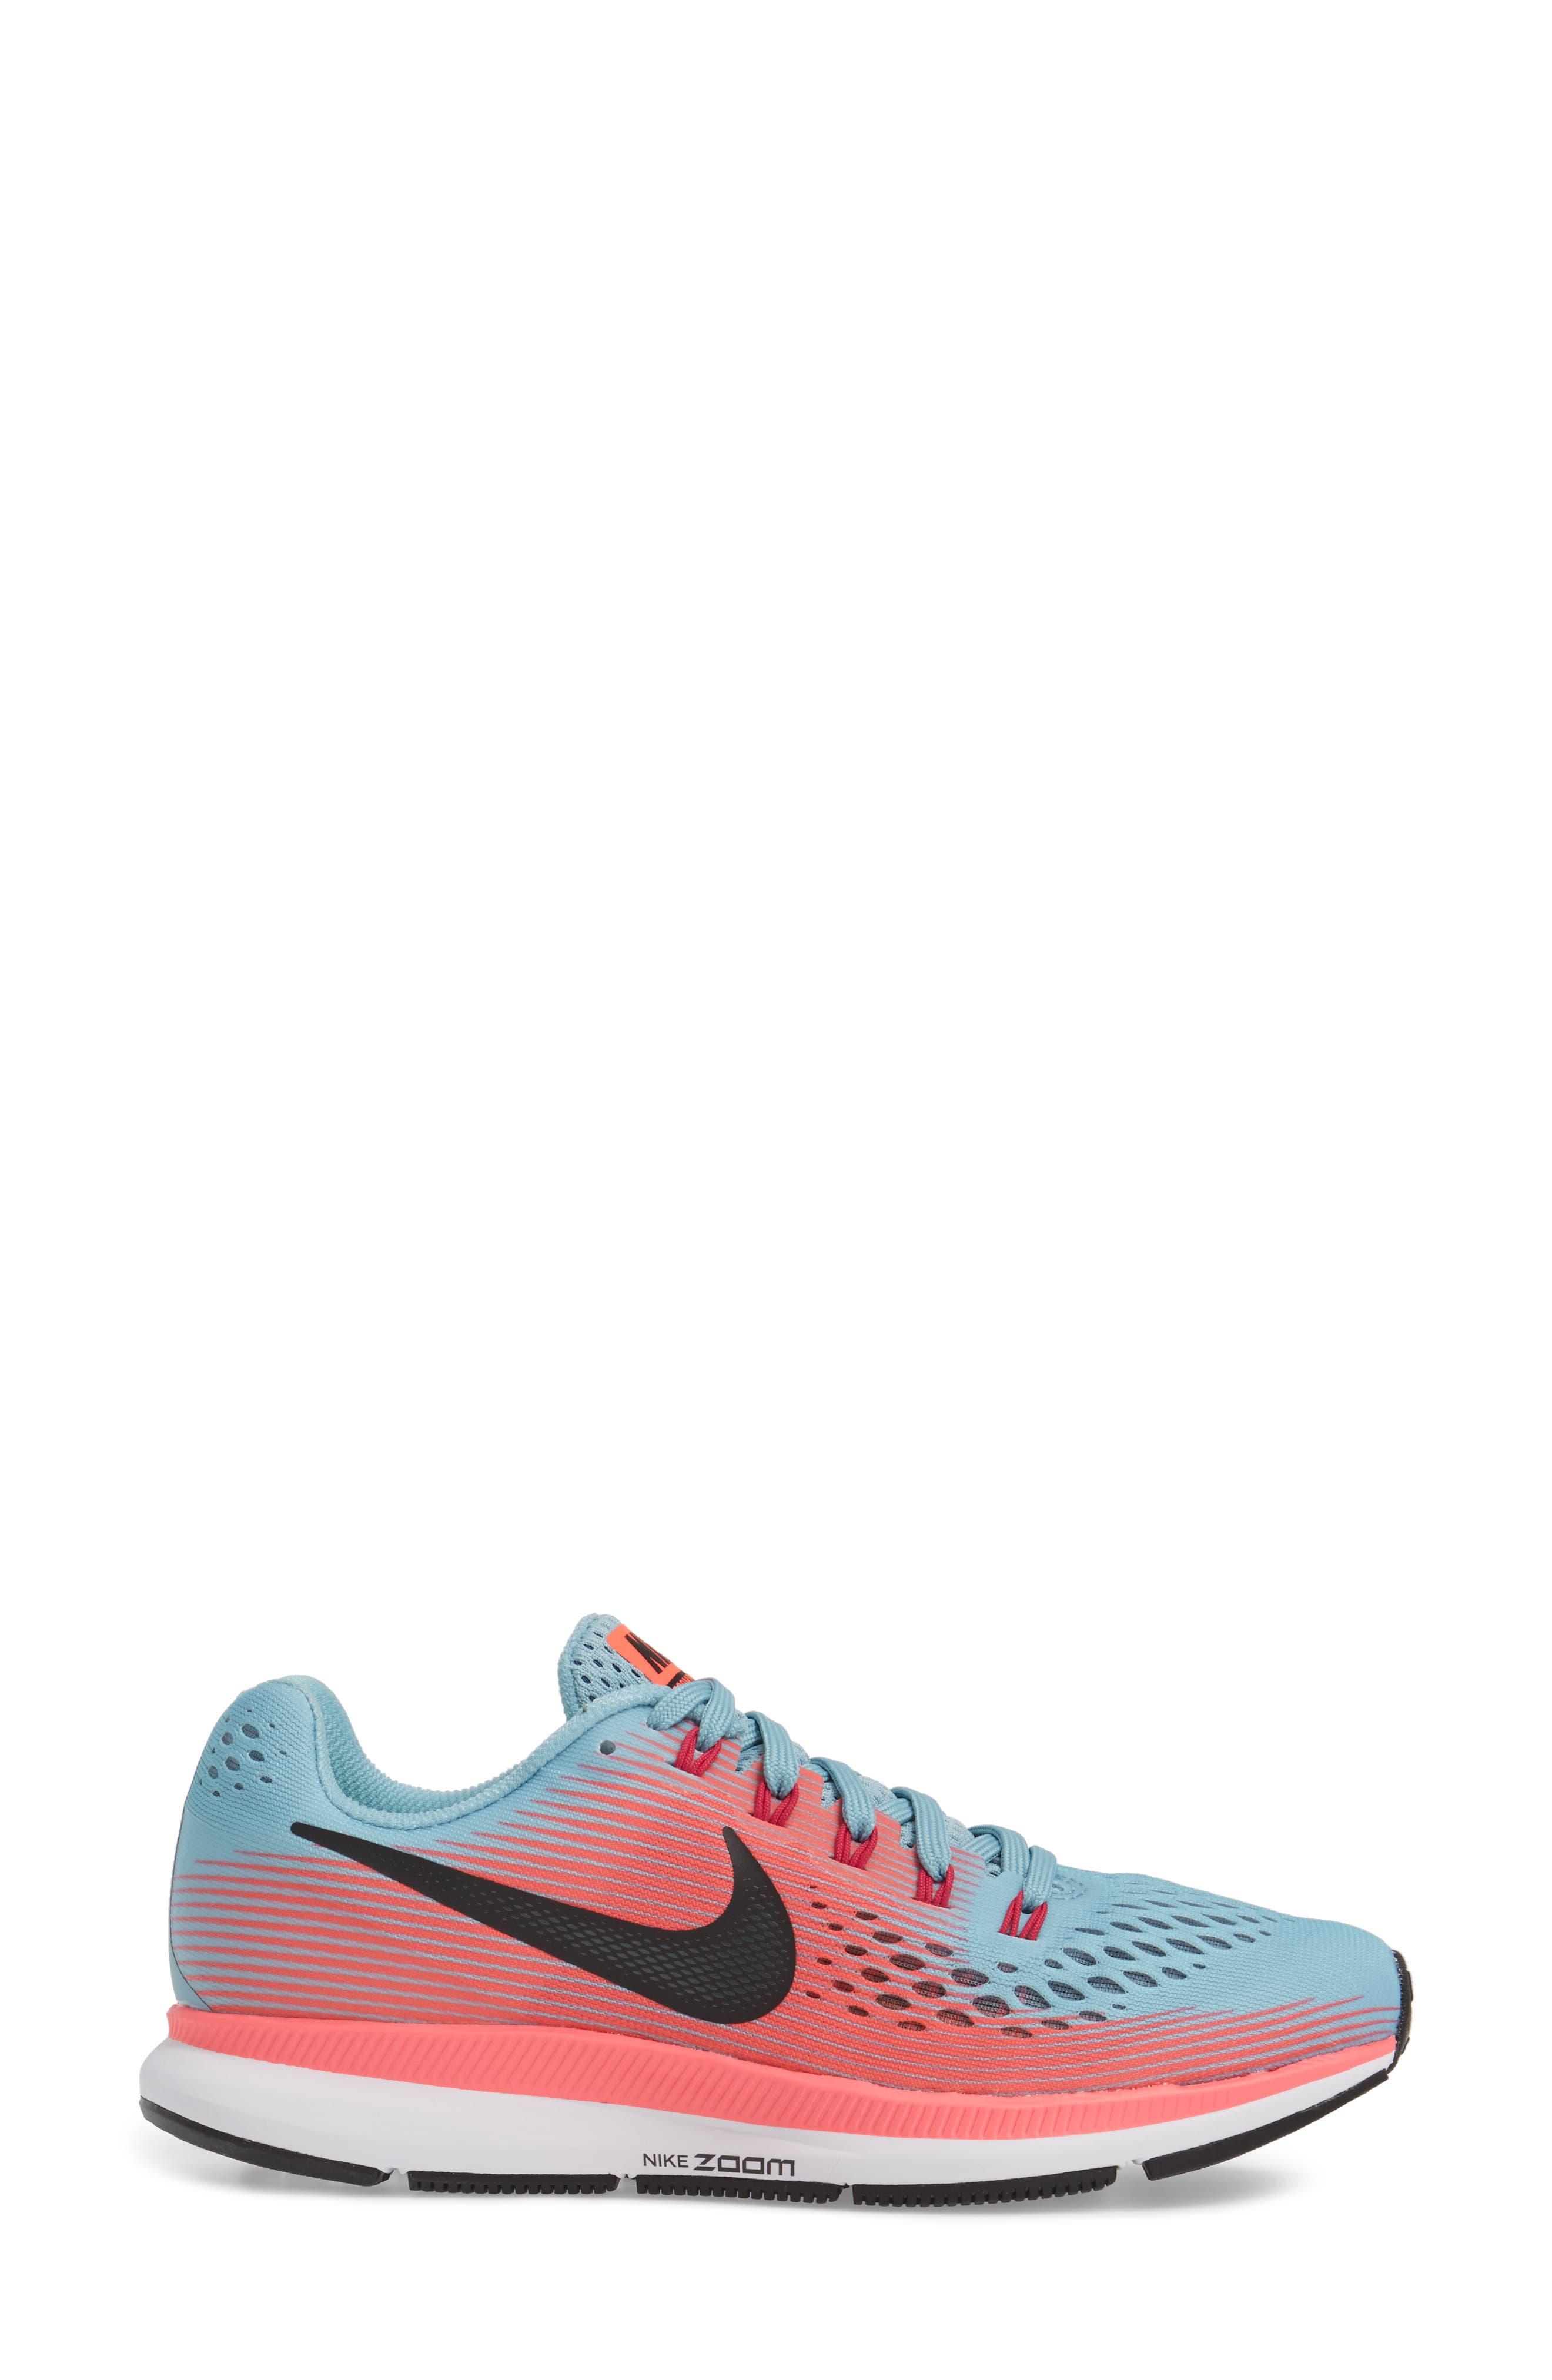 Air Zoom Pegasus 34 Running Shoe,                             Alternate thumbnail 3, color,                             Blue/ White/ Pink/ Fuchsia